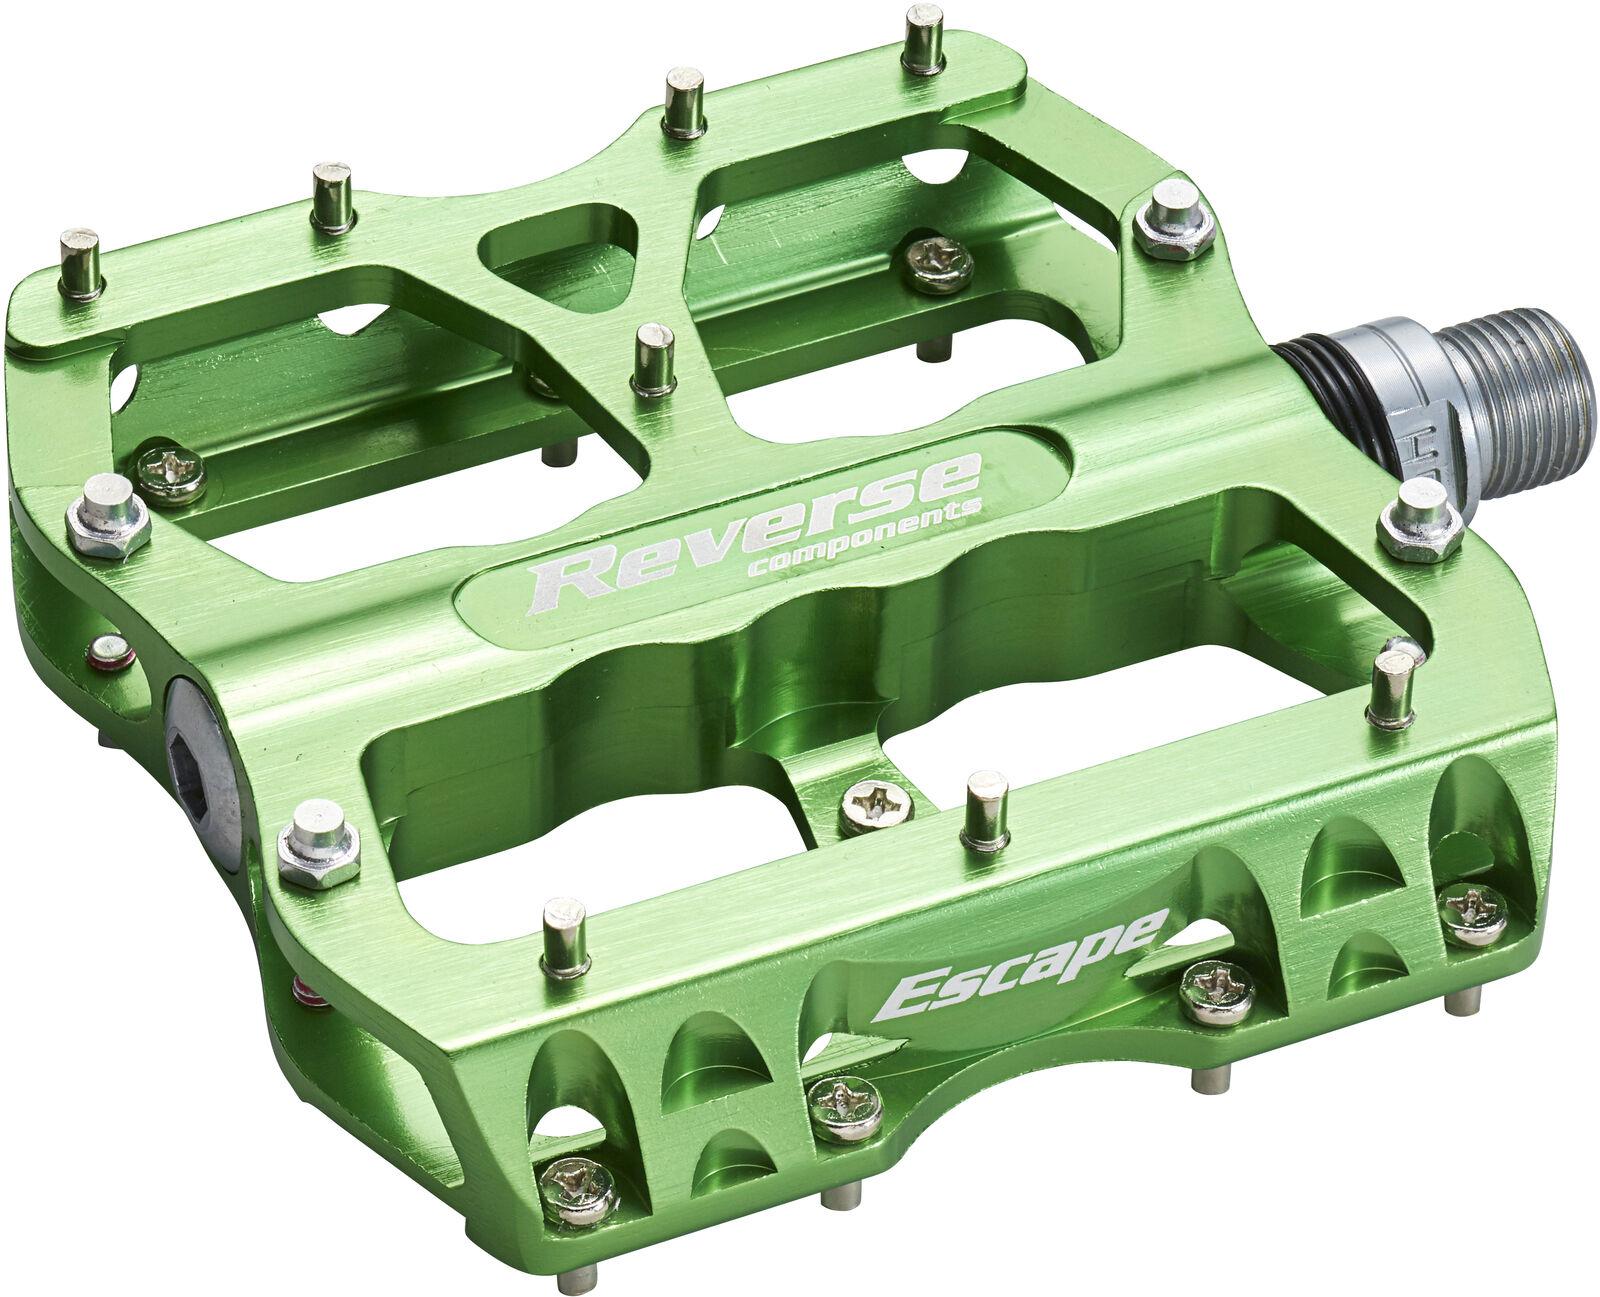 Reverse escape Flat bicicleta pedal verde claro